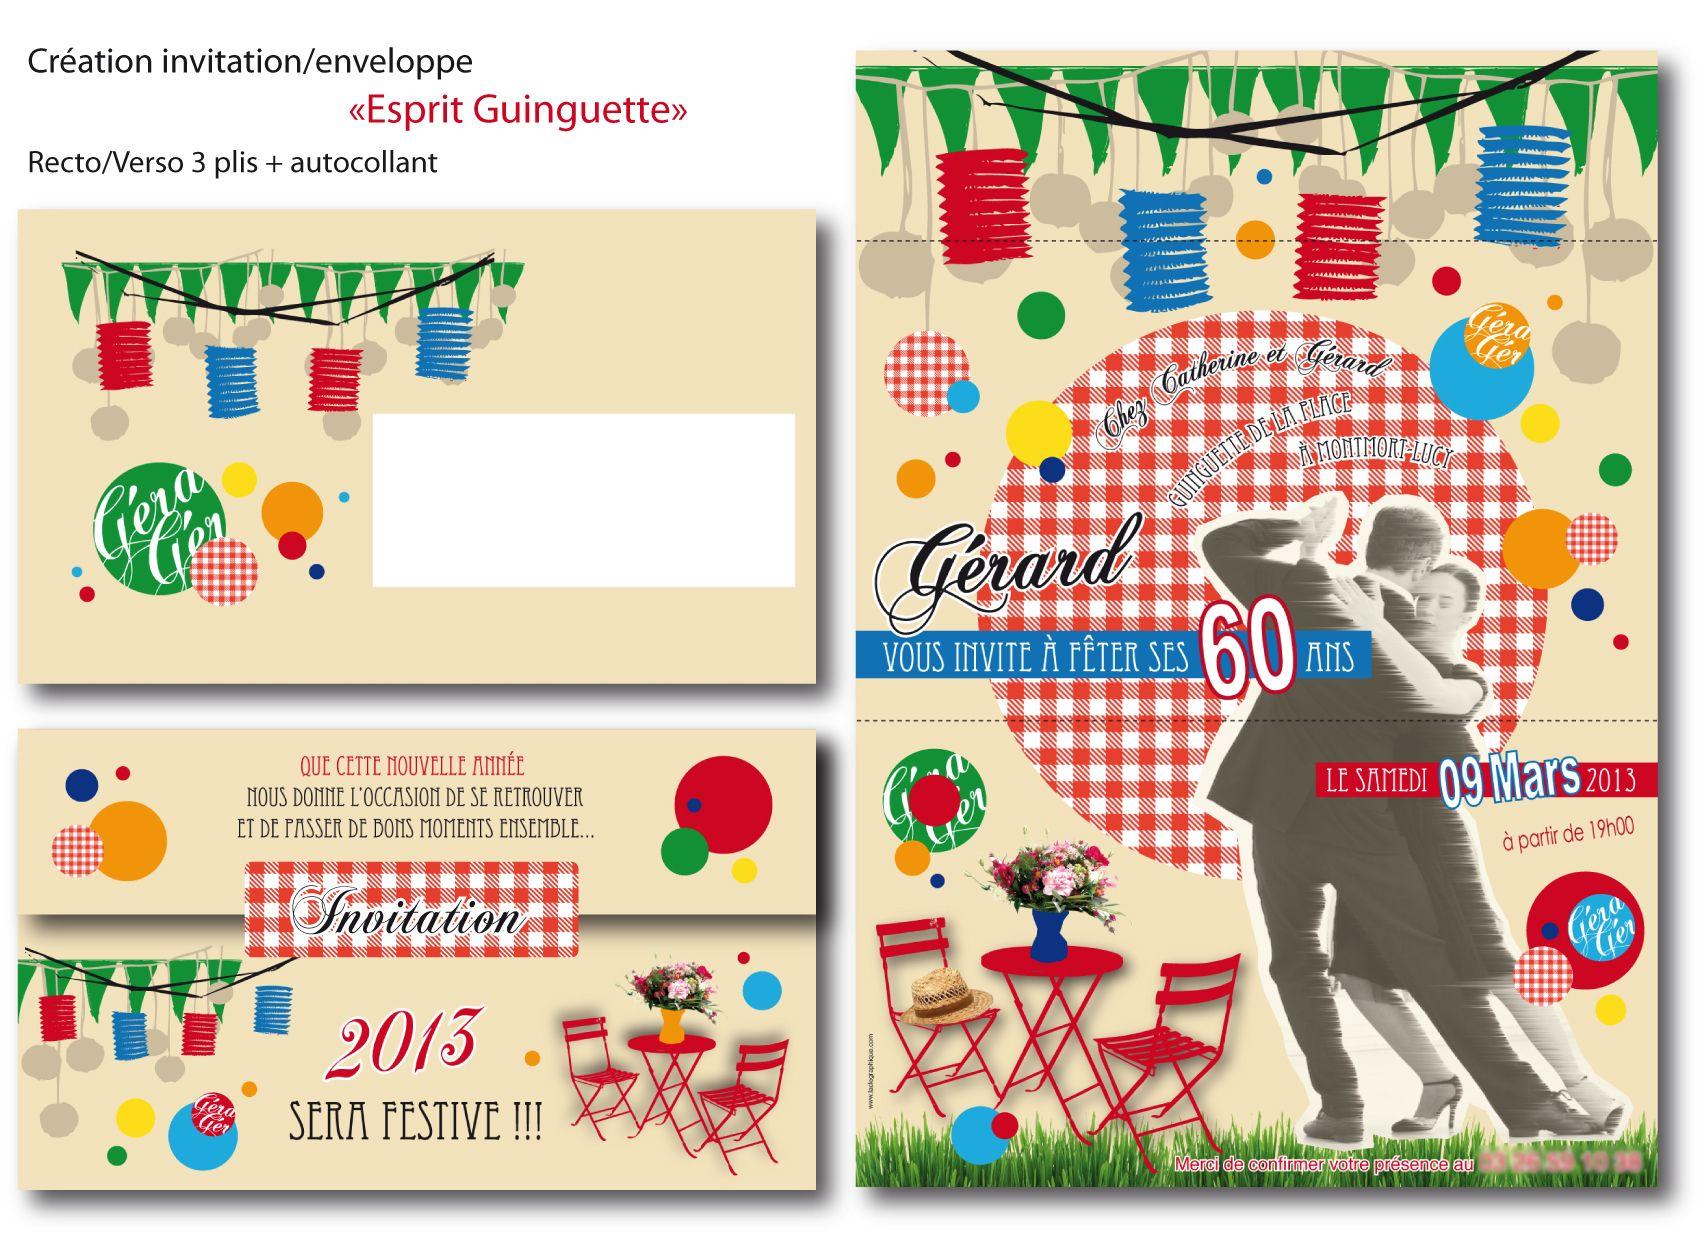 Invitation-guinguette.jpg (1704×1240) | Guinguette, Invitation anniversaire, Invitation